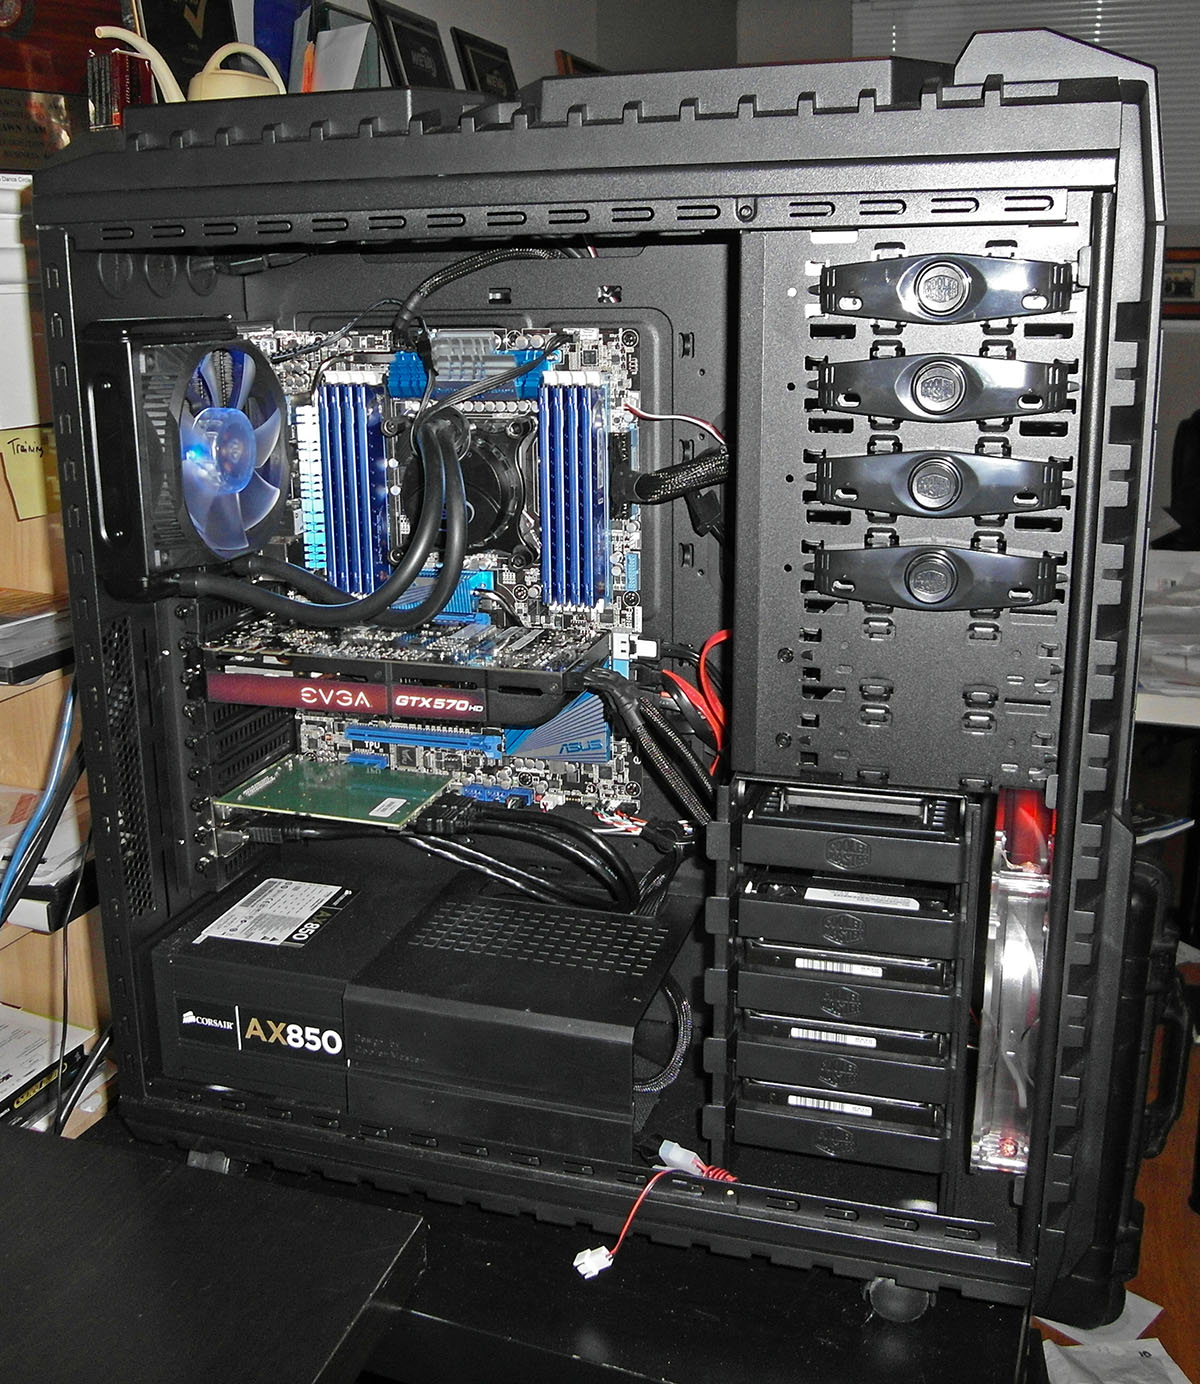 HEX-Core video editing computer